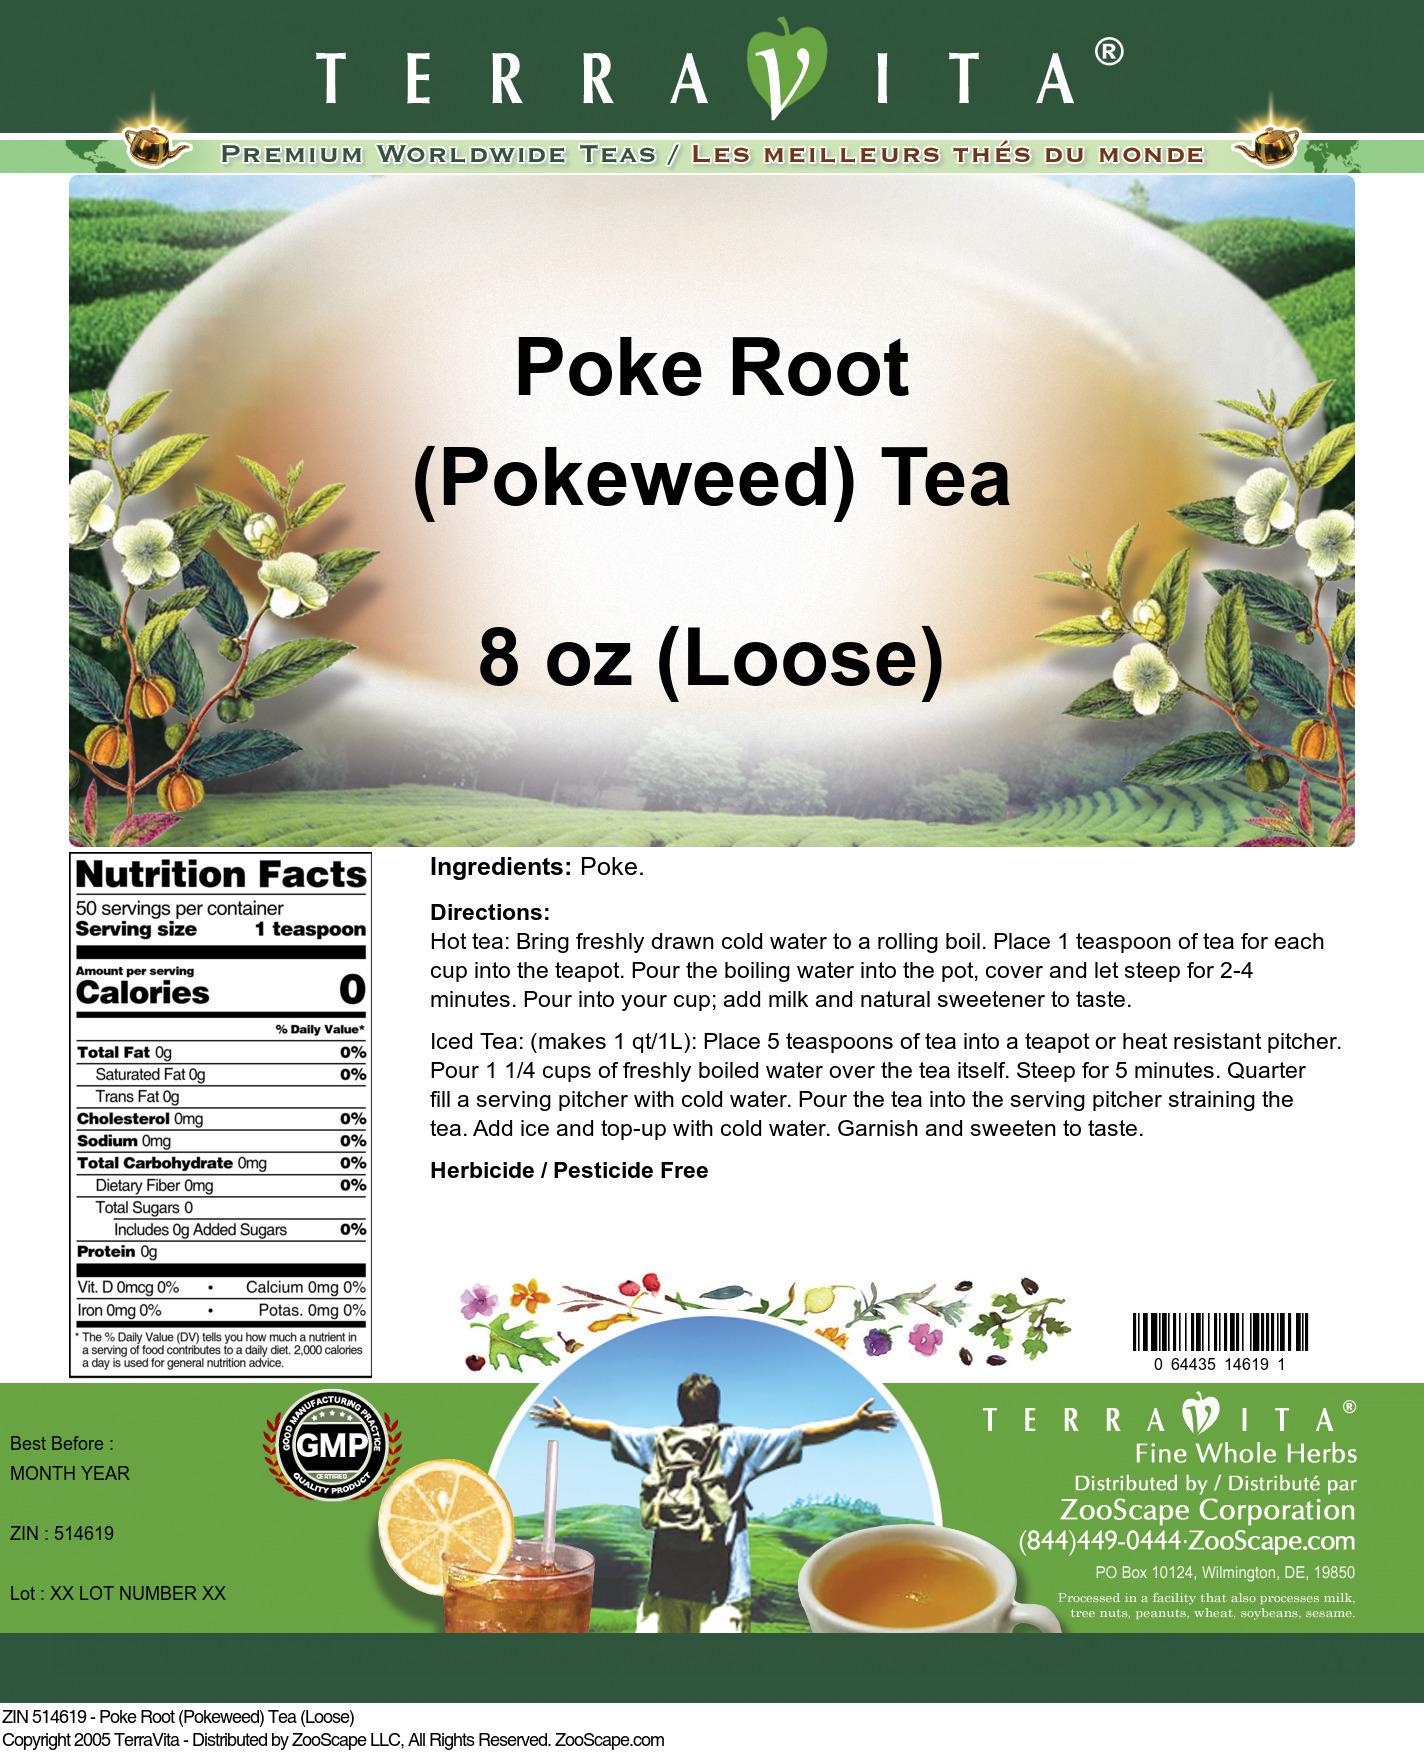 Poke Root (Pokeweed) Tea (Loose)